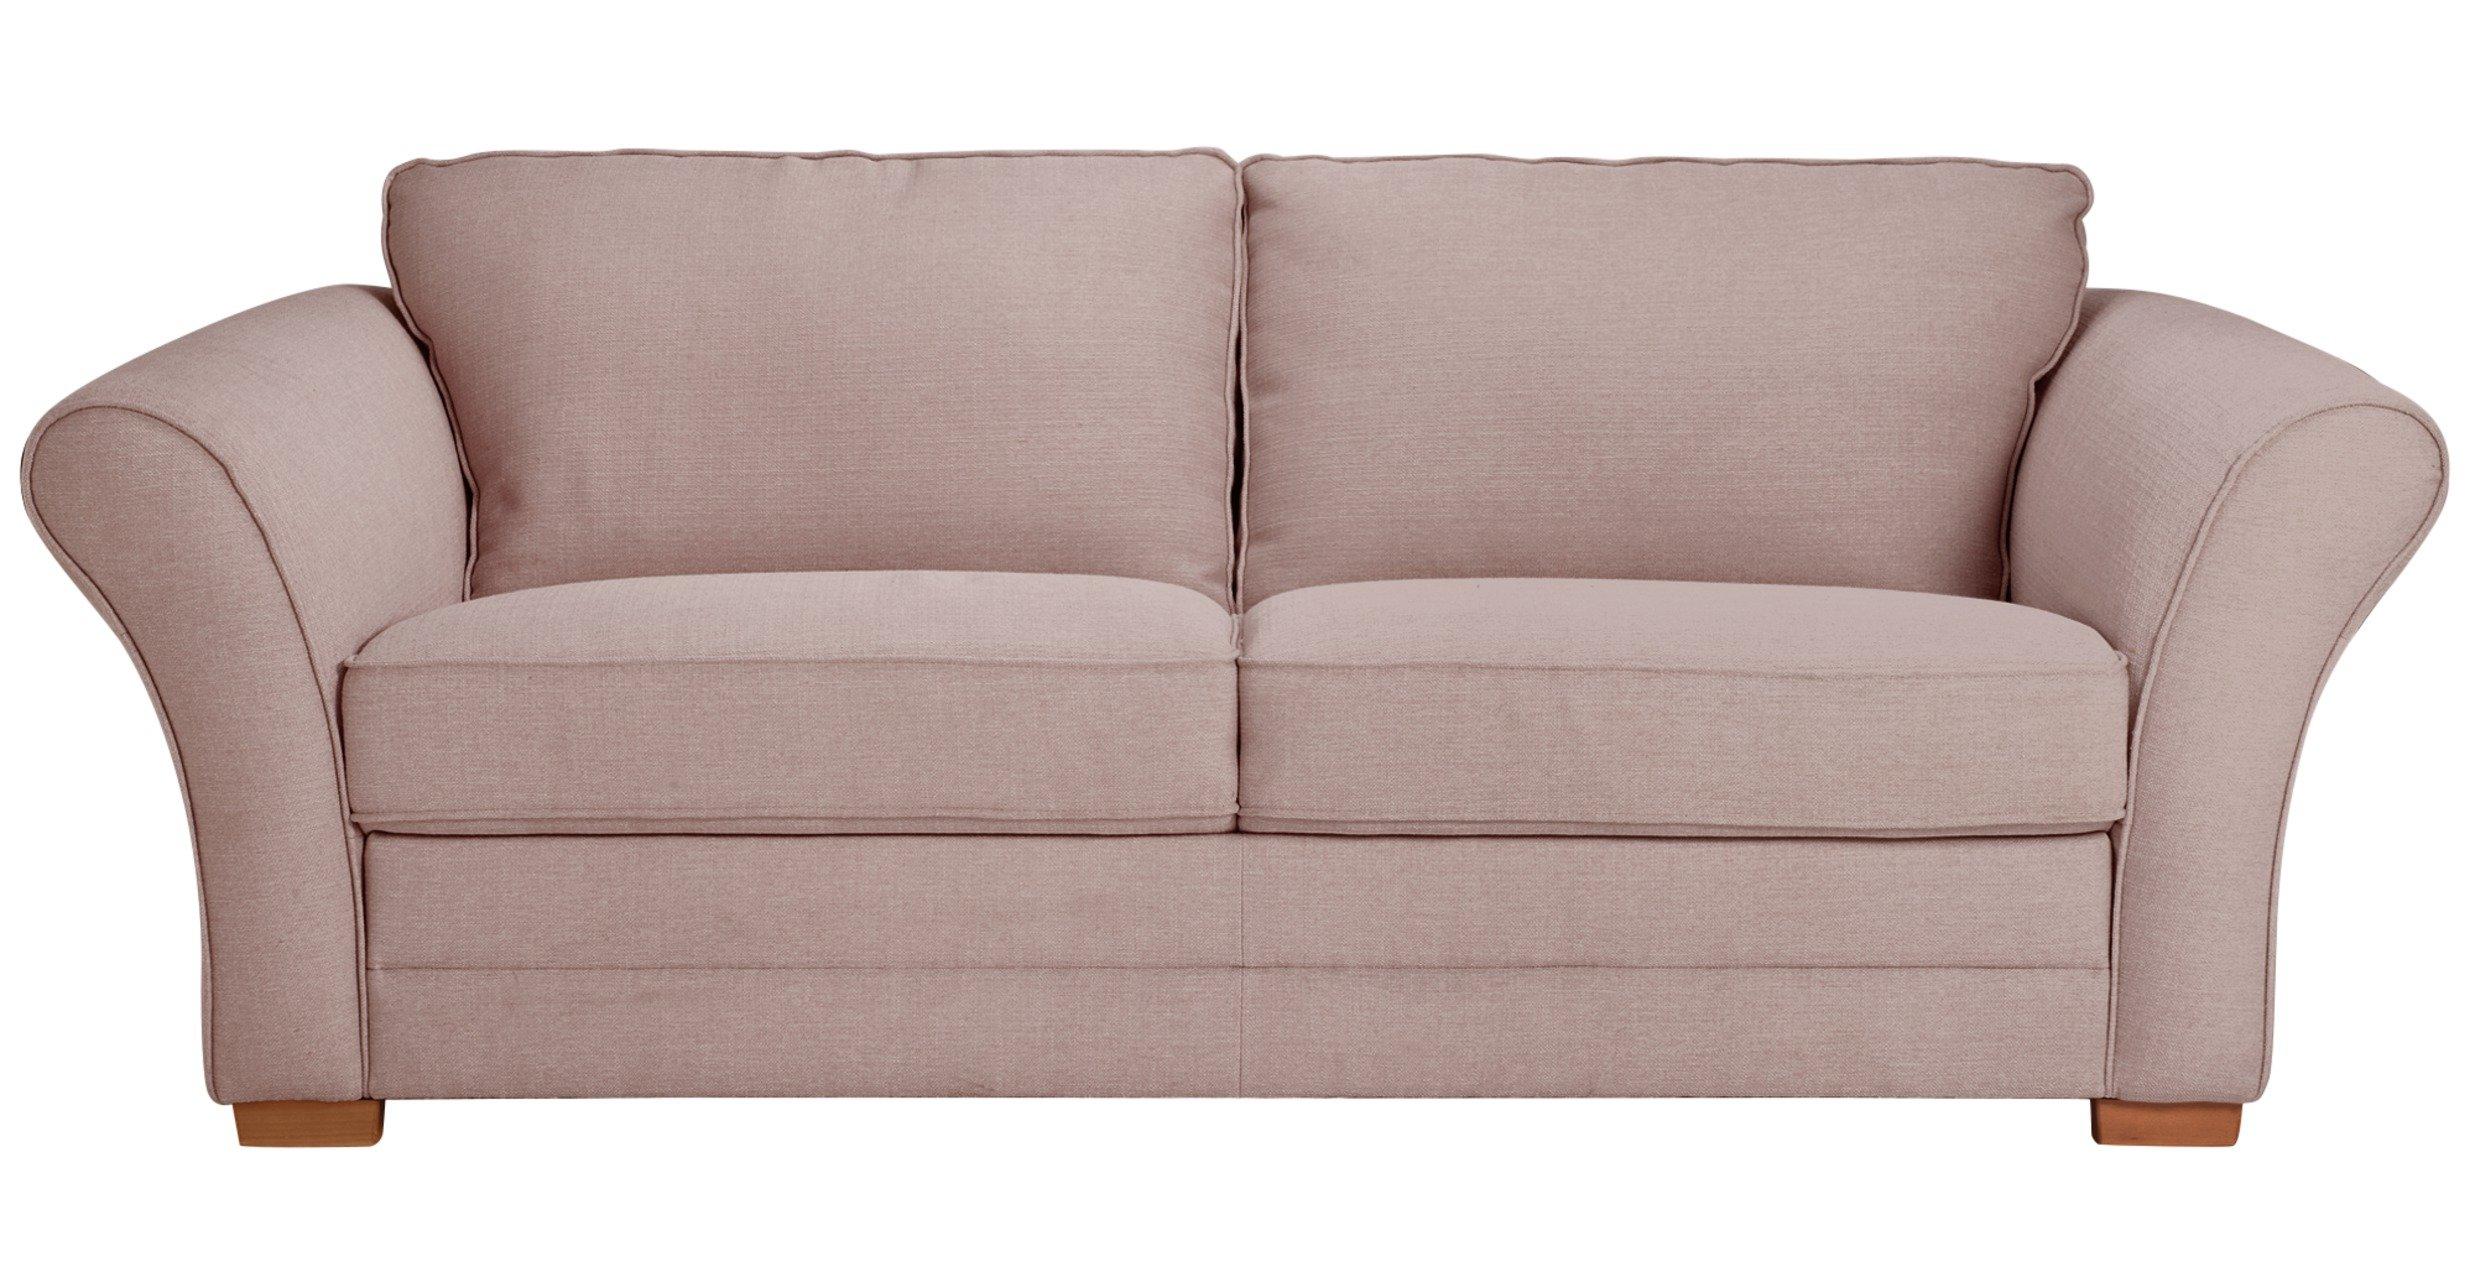 - Argos Home Thornton 3 Seater Fabric Sofa Bed Reviews